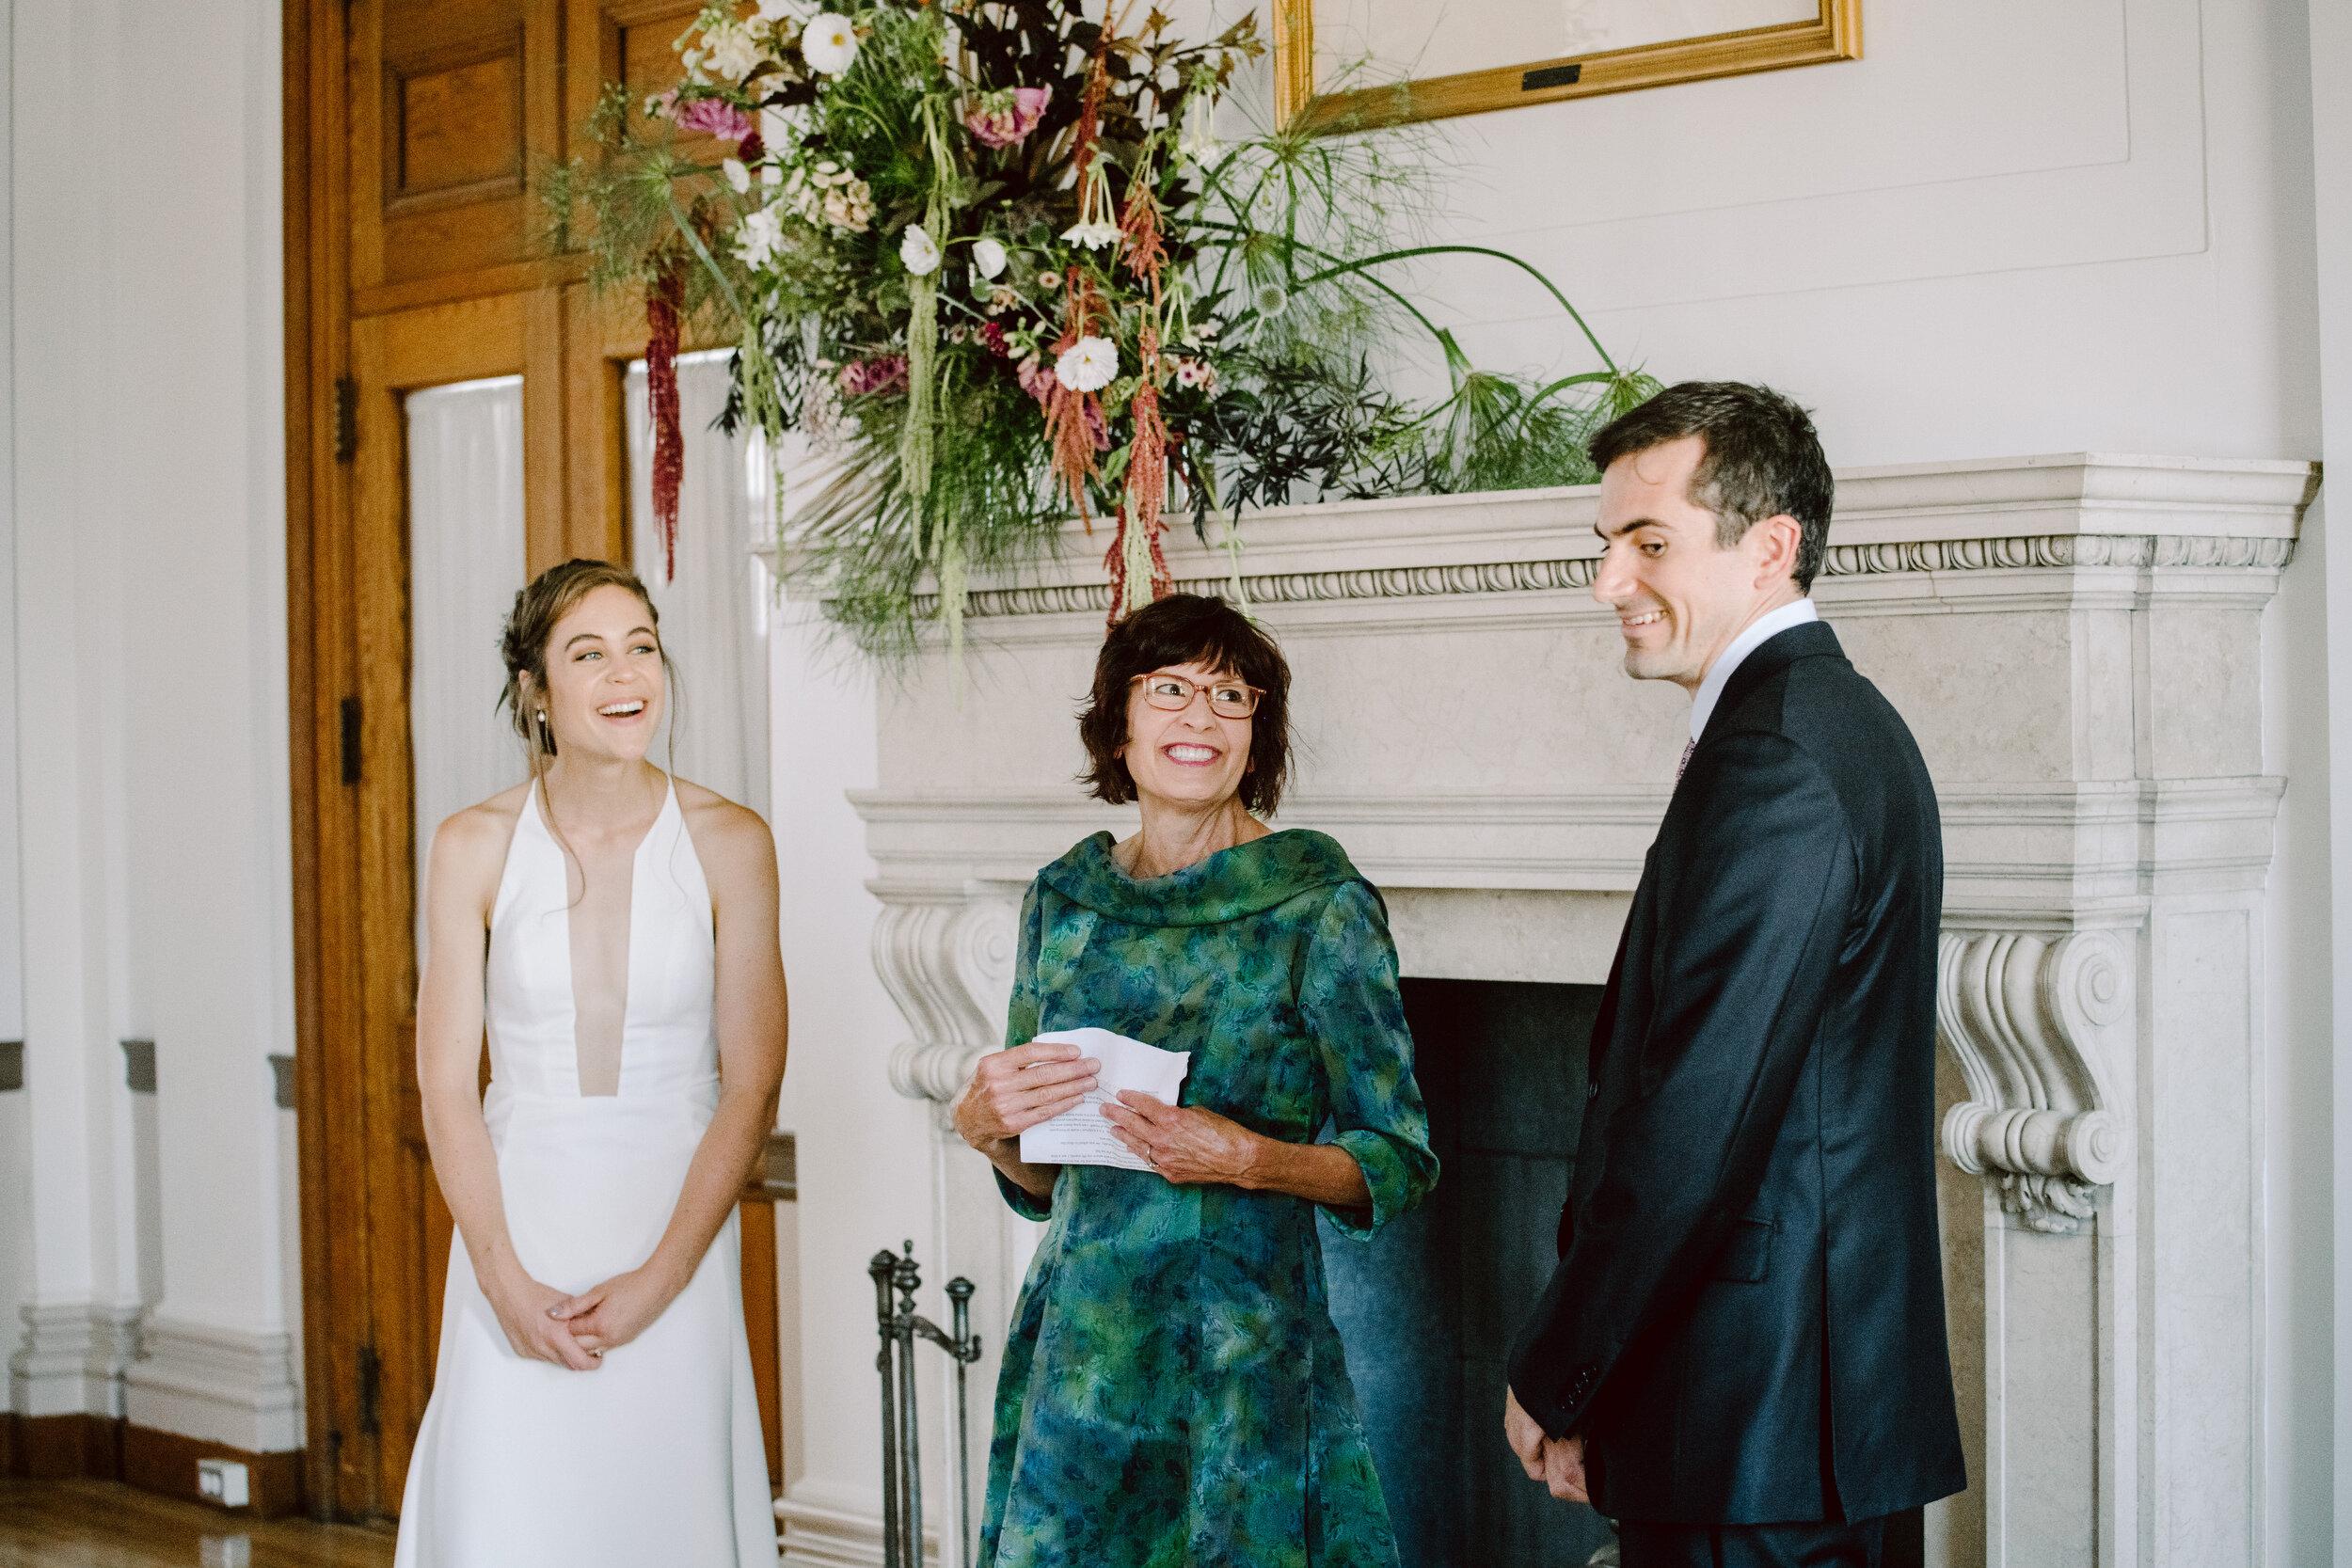 portland_city_hall_wedding_mikhail_glabet_22.JPG